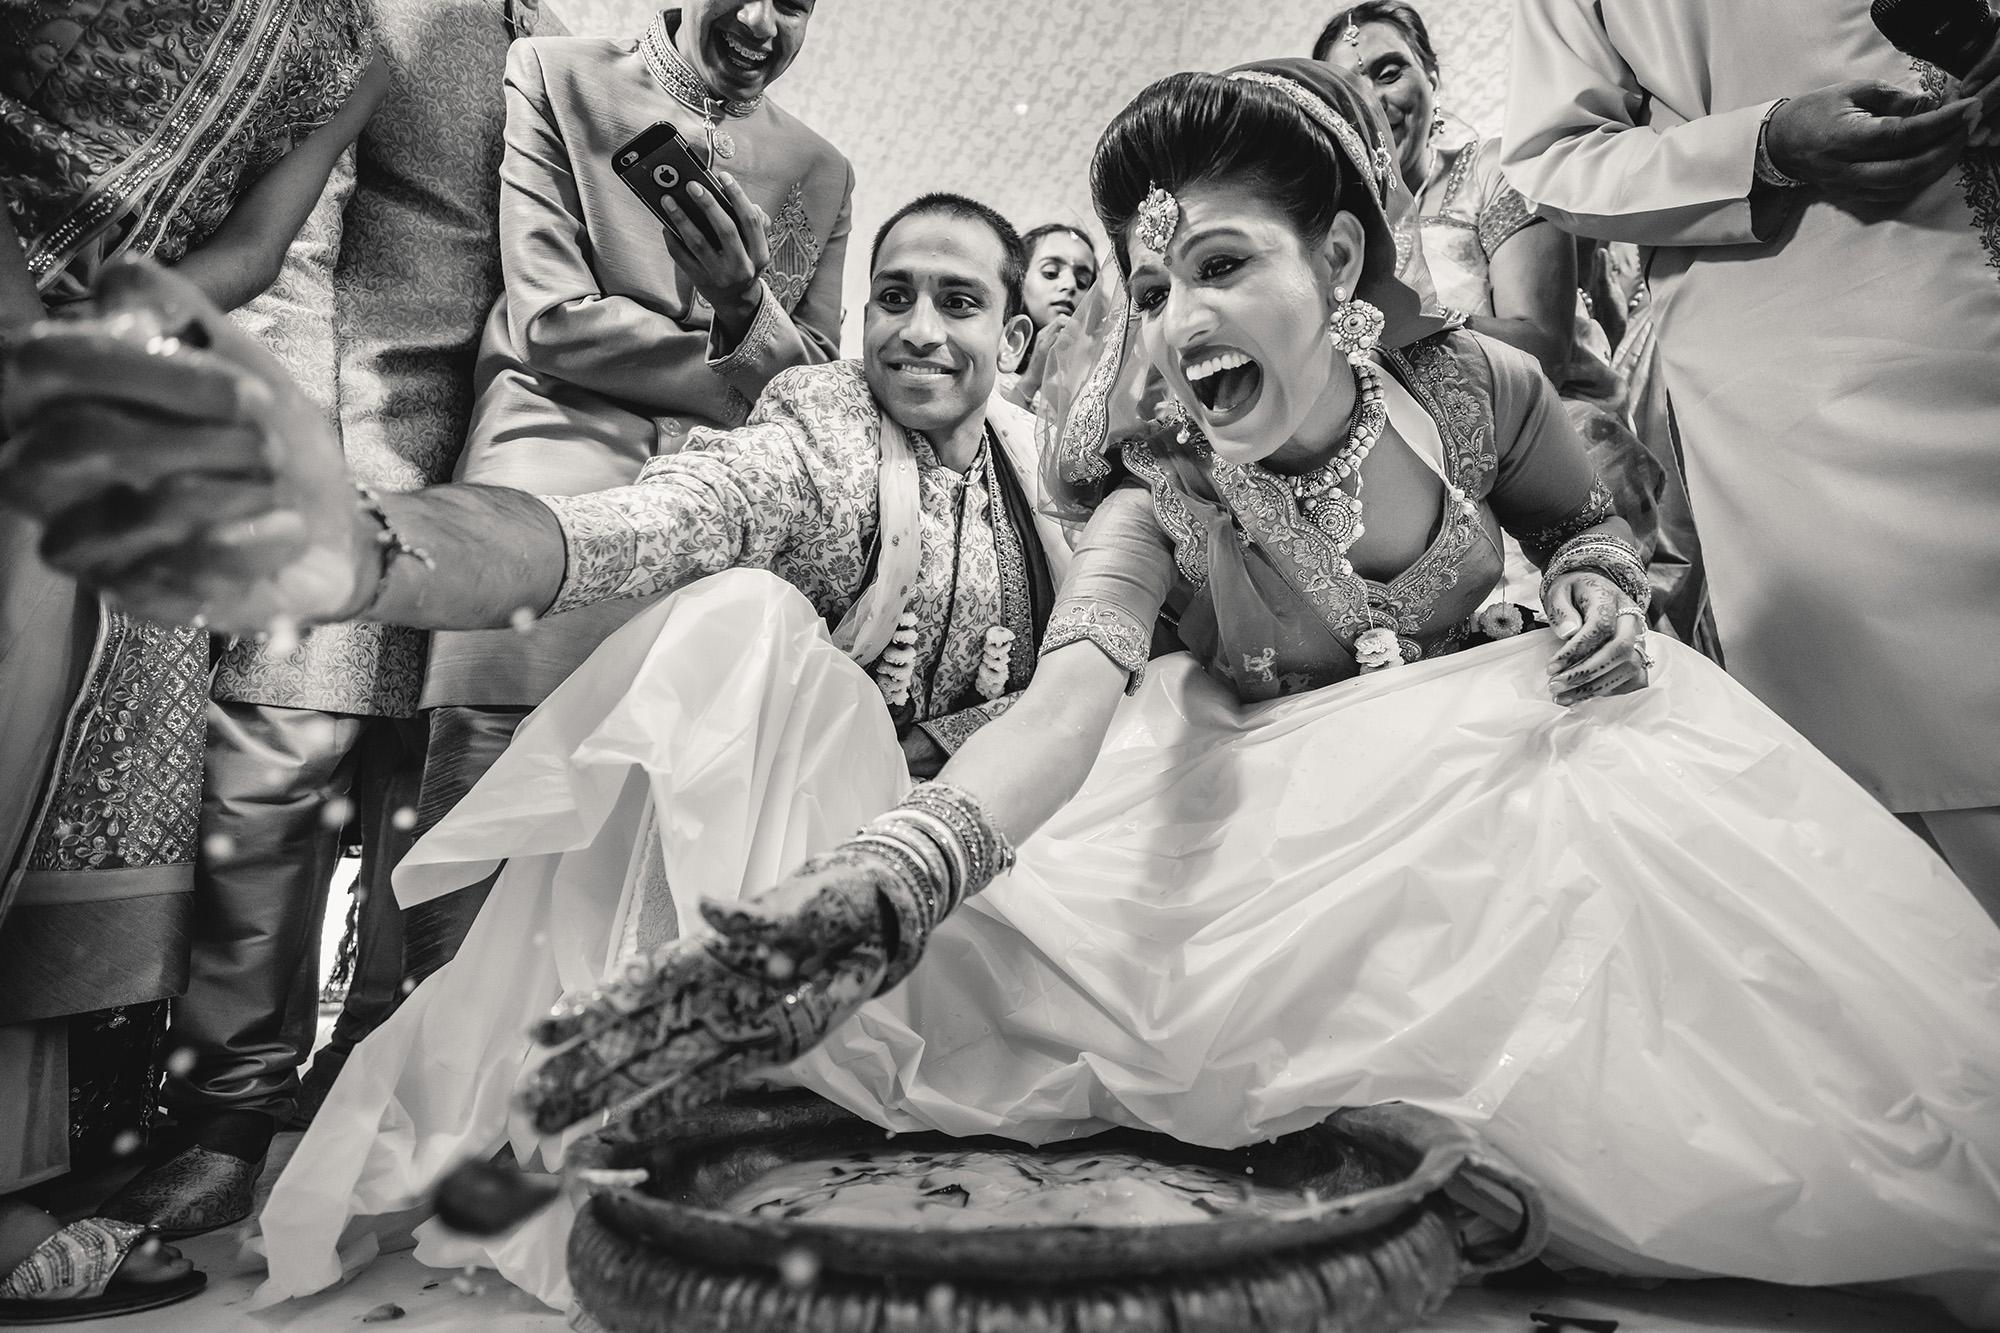 hindu wedding games between the bride and groom